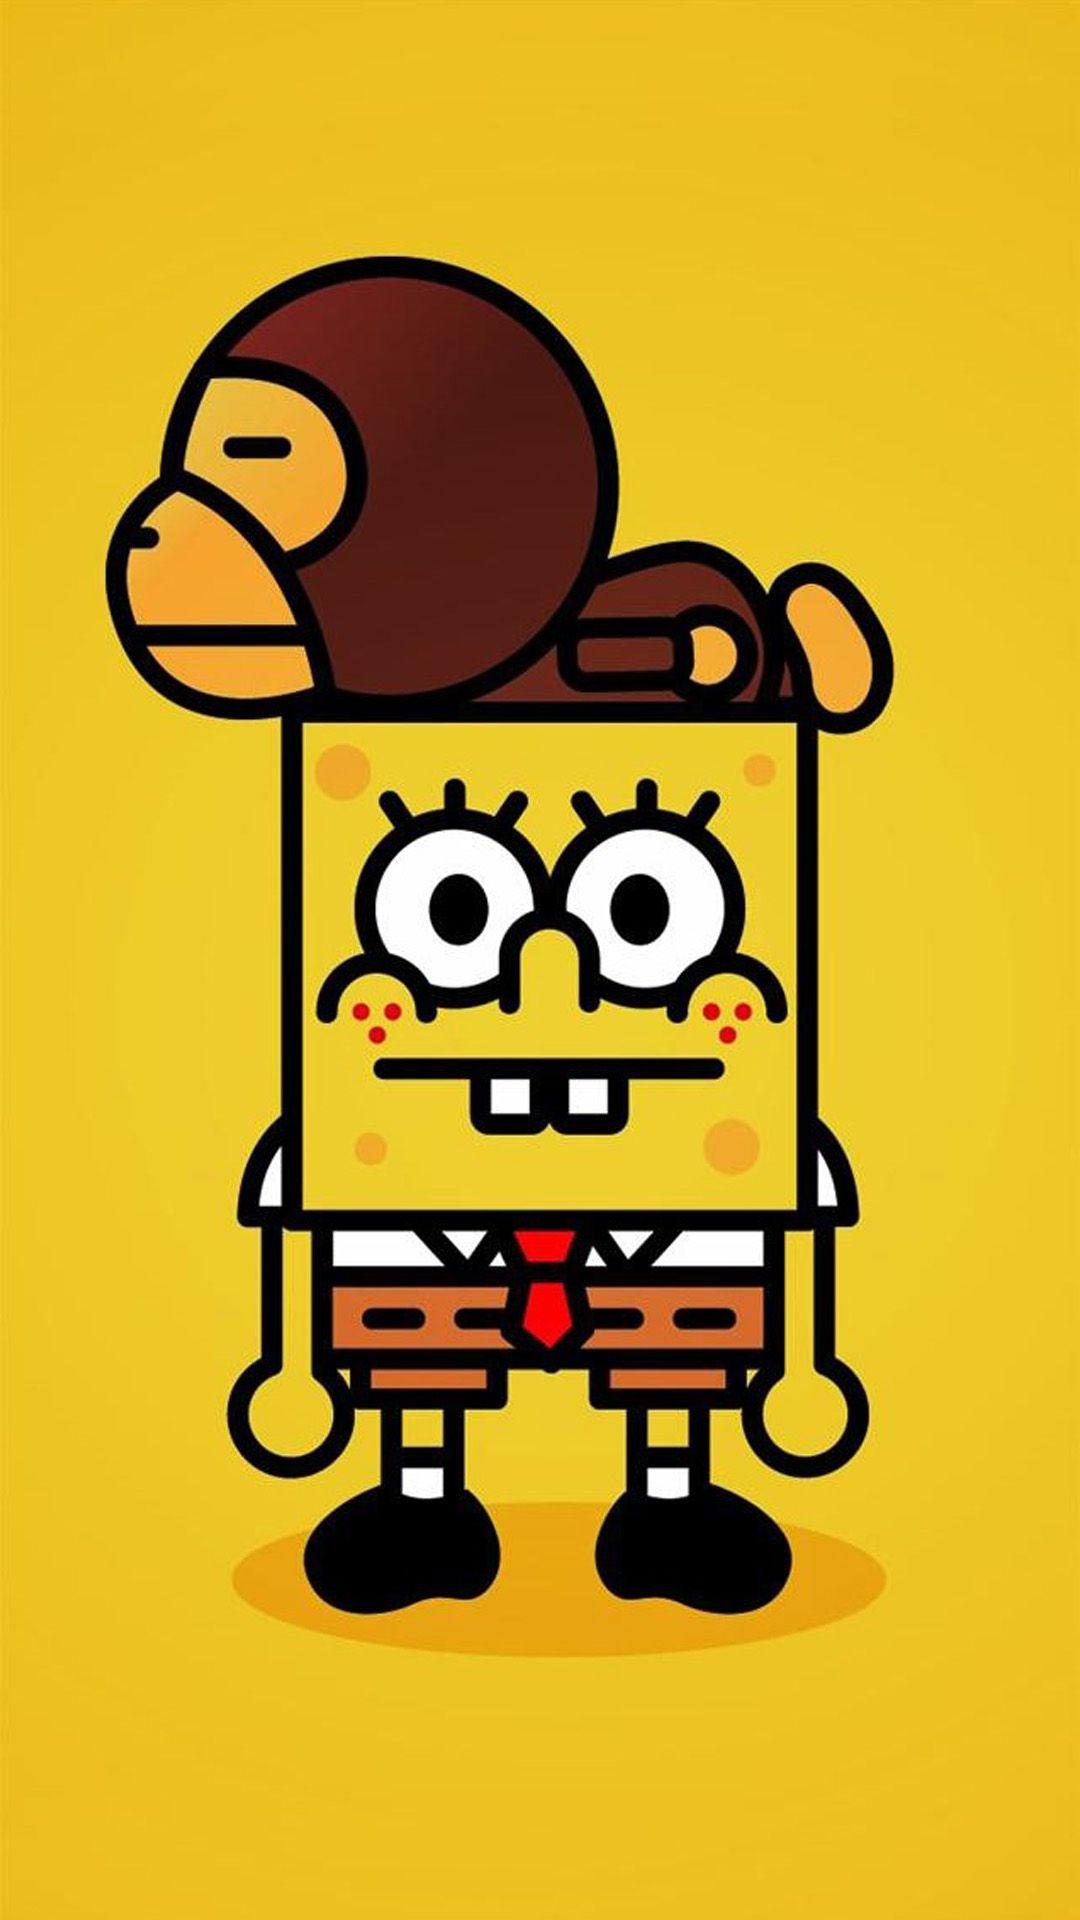 TAP AND GET THE FREE APP! Fun SpongeBob SquarePants with